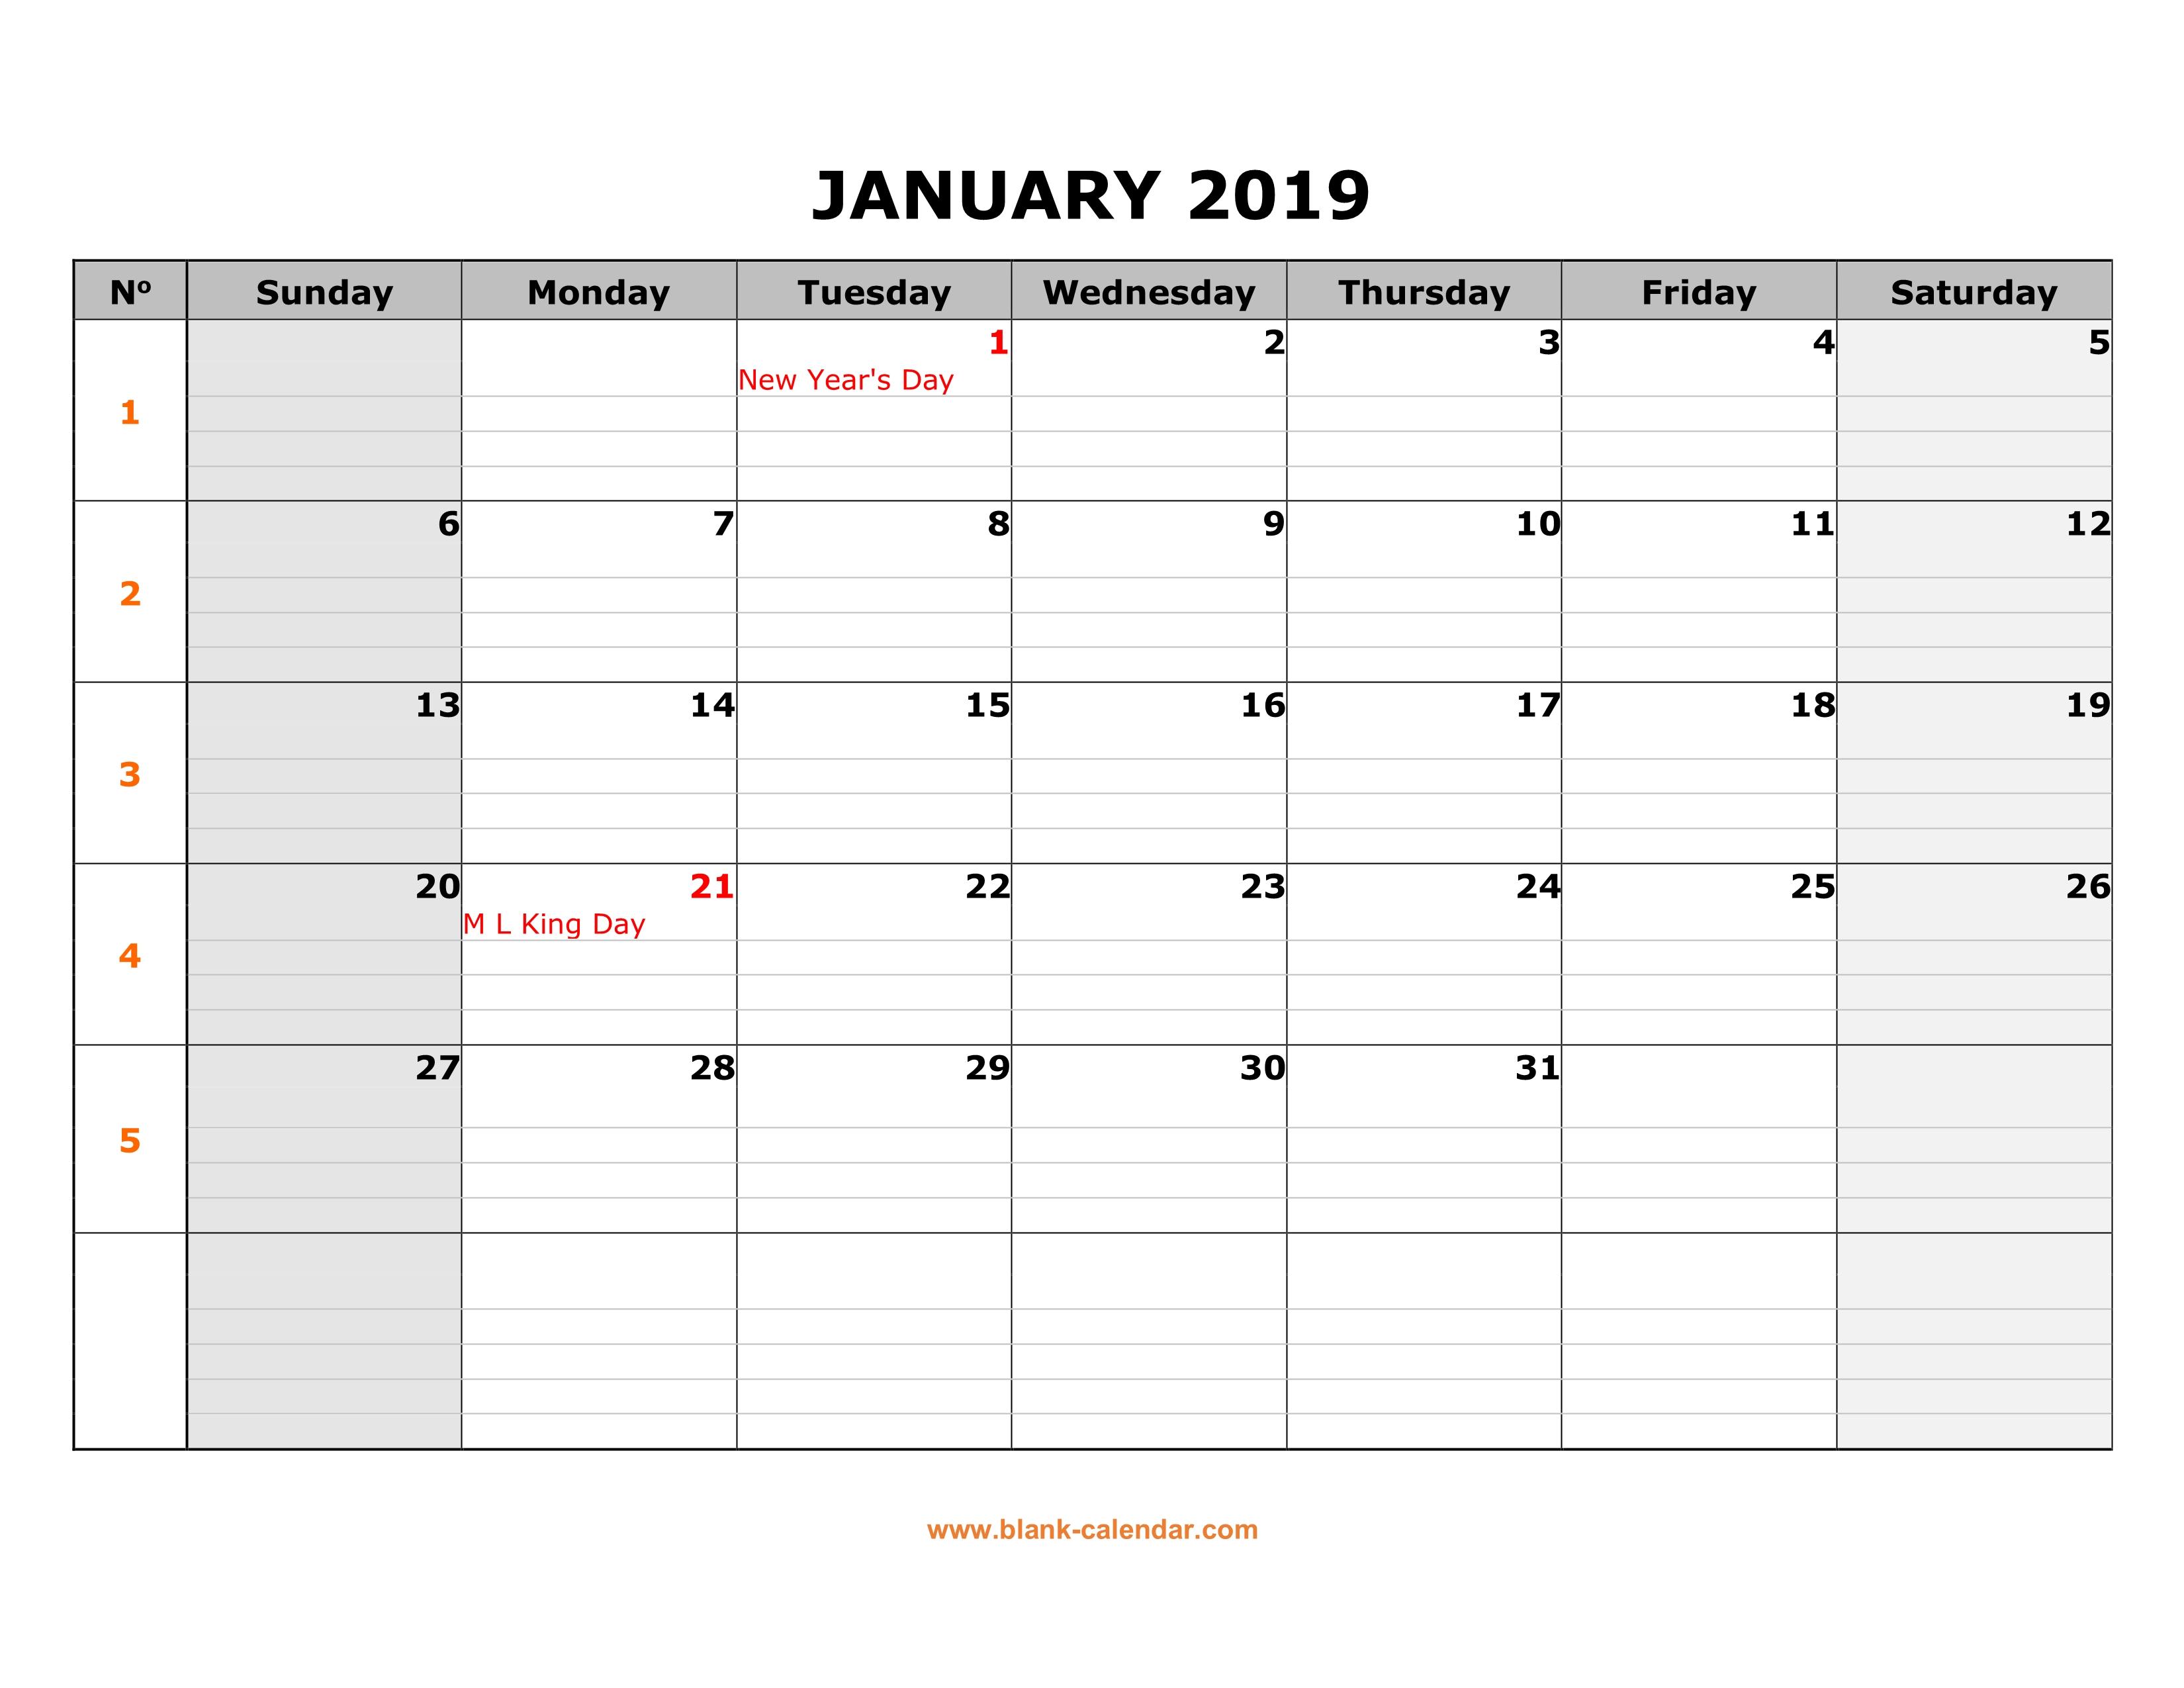 Blank Calendar Large Squares